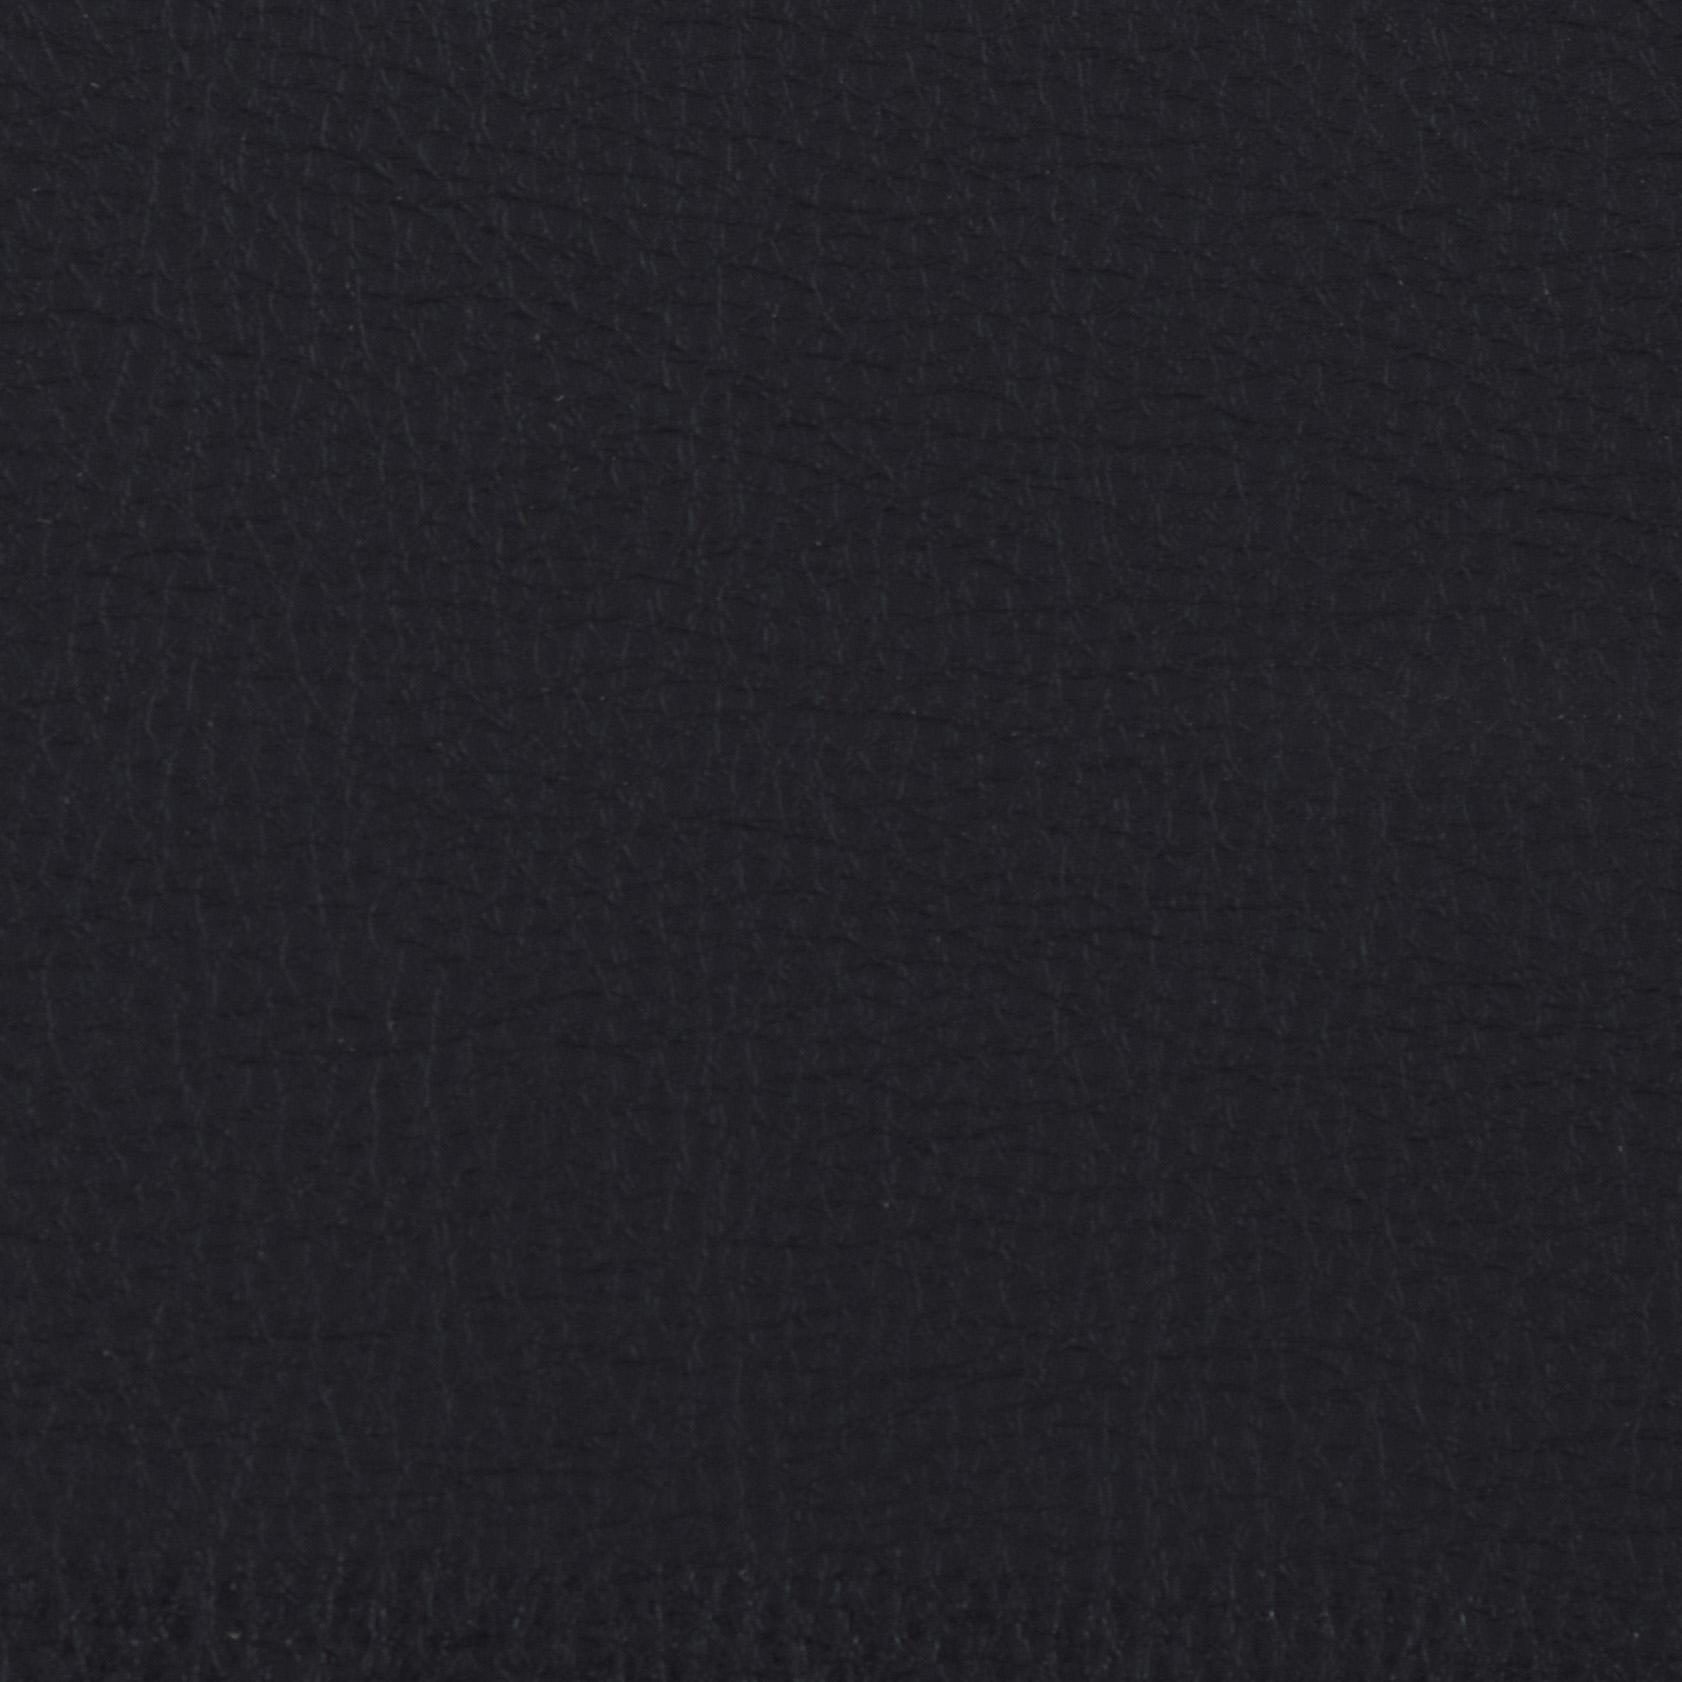 2PRO BLACK PRO-679